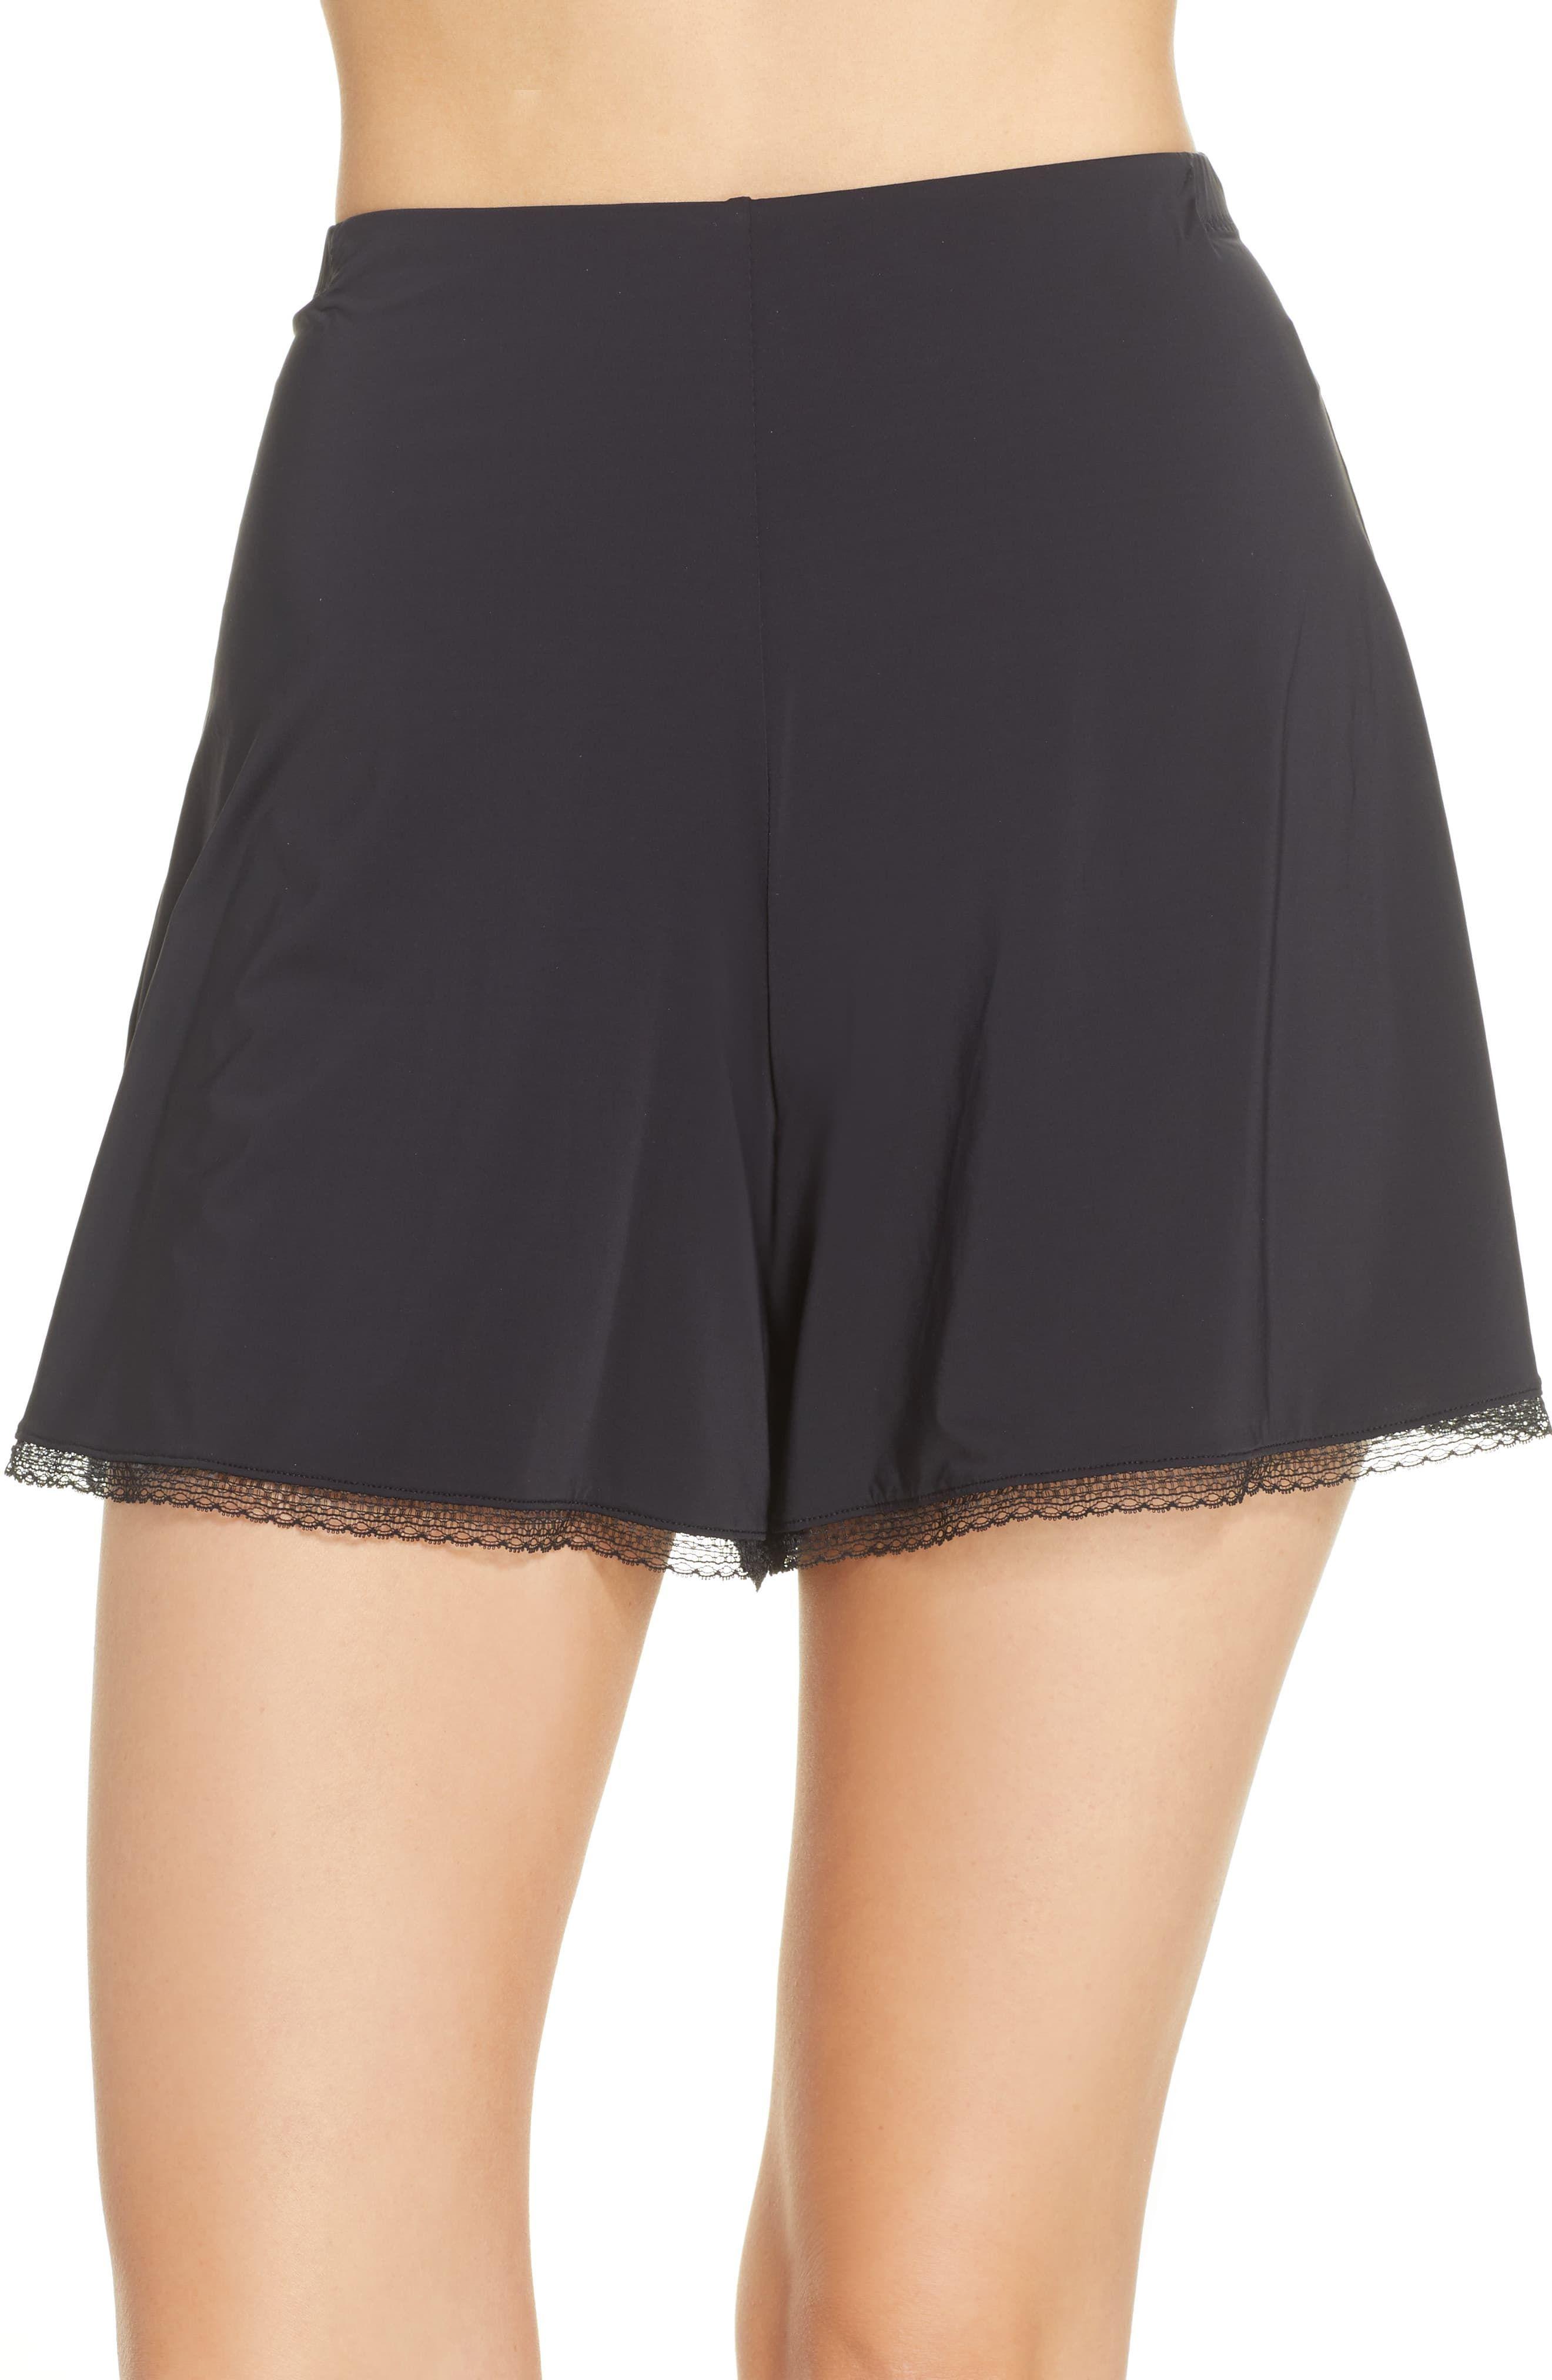 All Woman Silky Satin Waist-Slip Under Skirt Plus Size Extra Large XXXXL